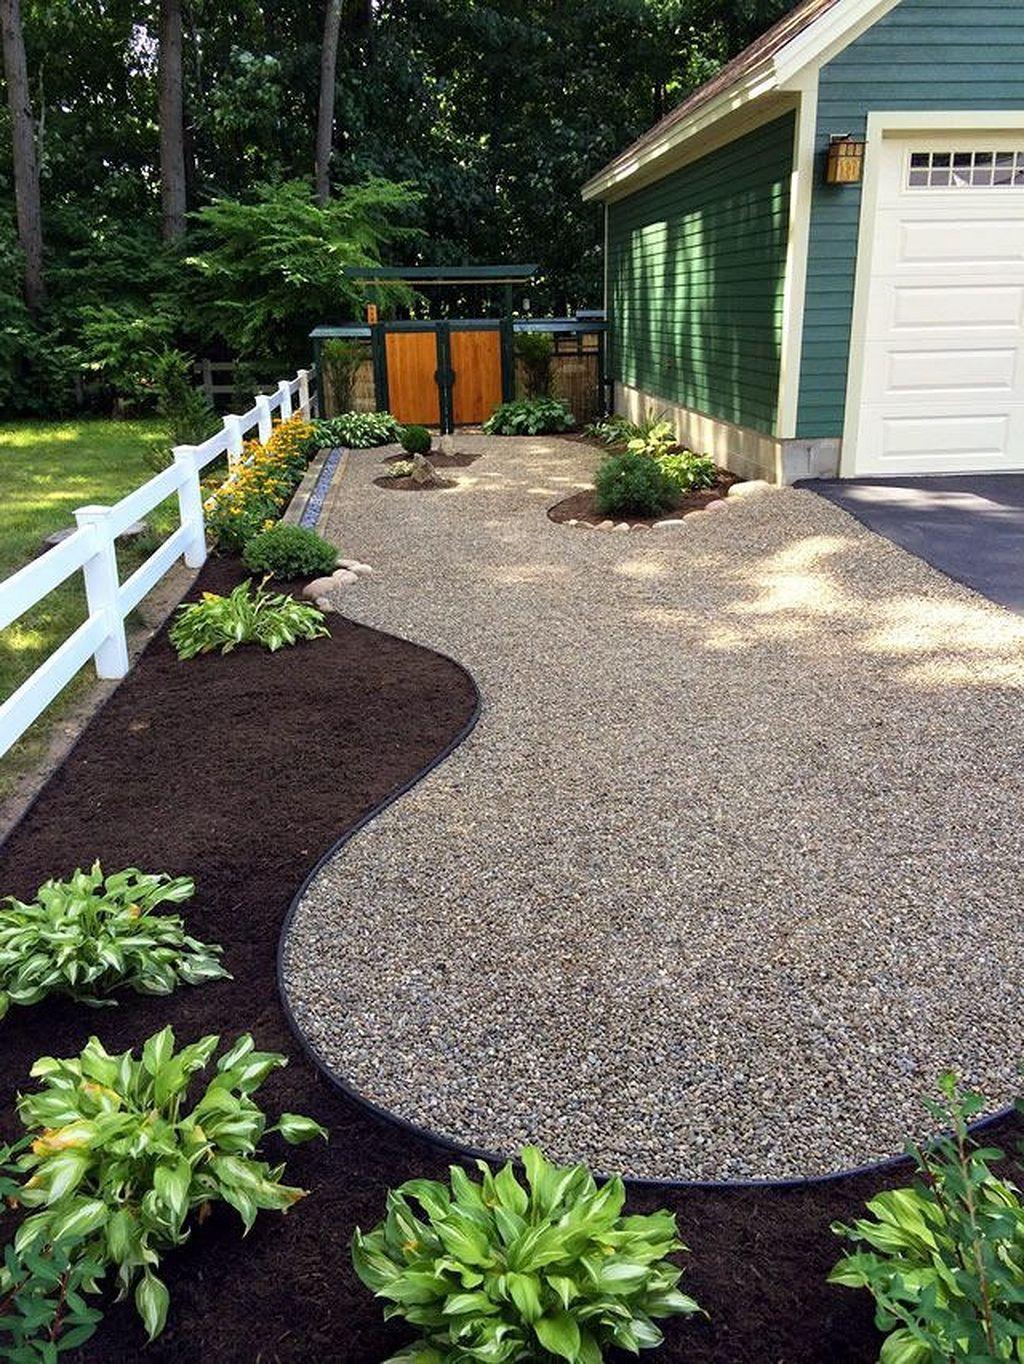 Amazing Modern Rock Garden Ideas For Backyard (78 ...